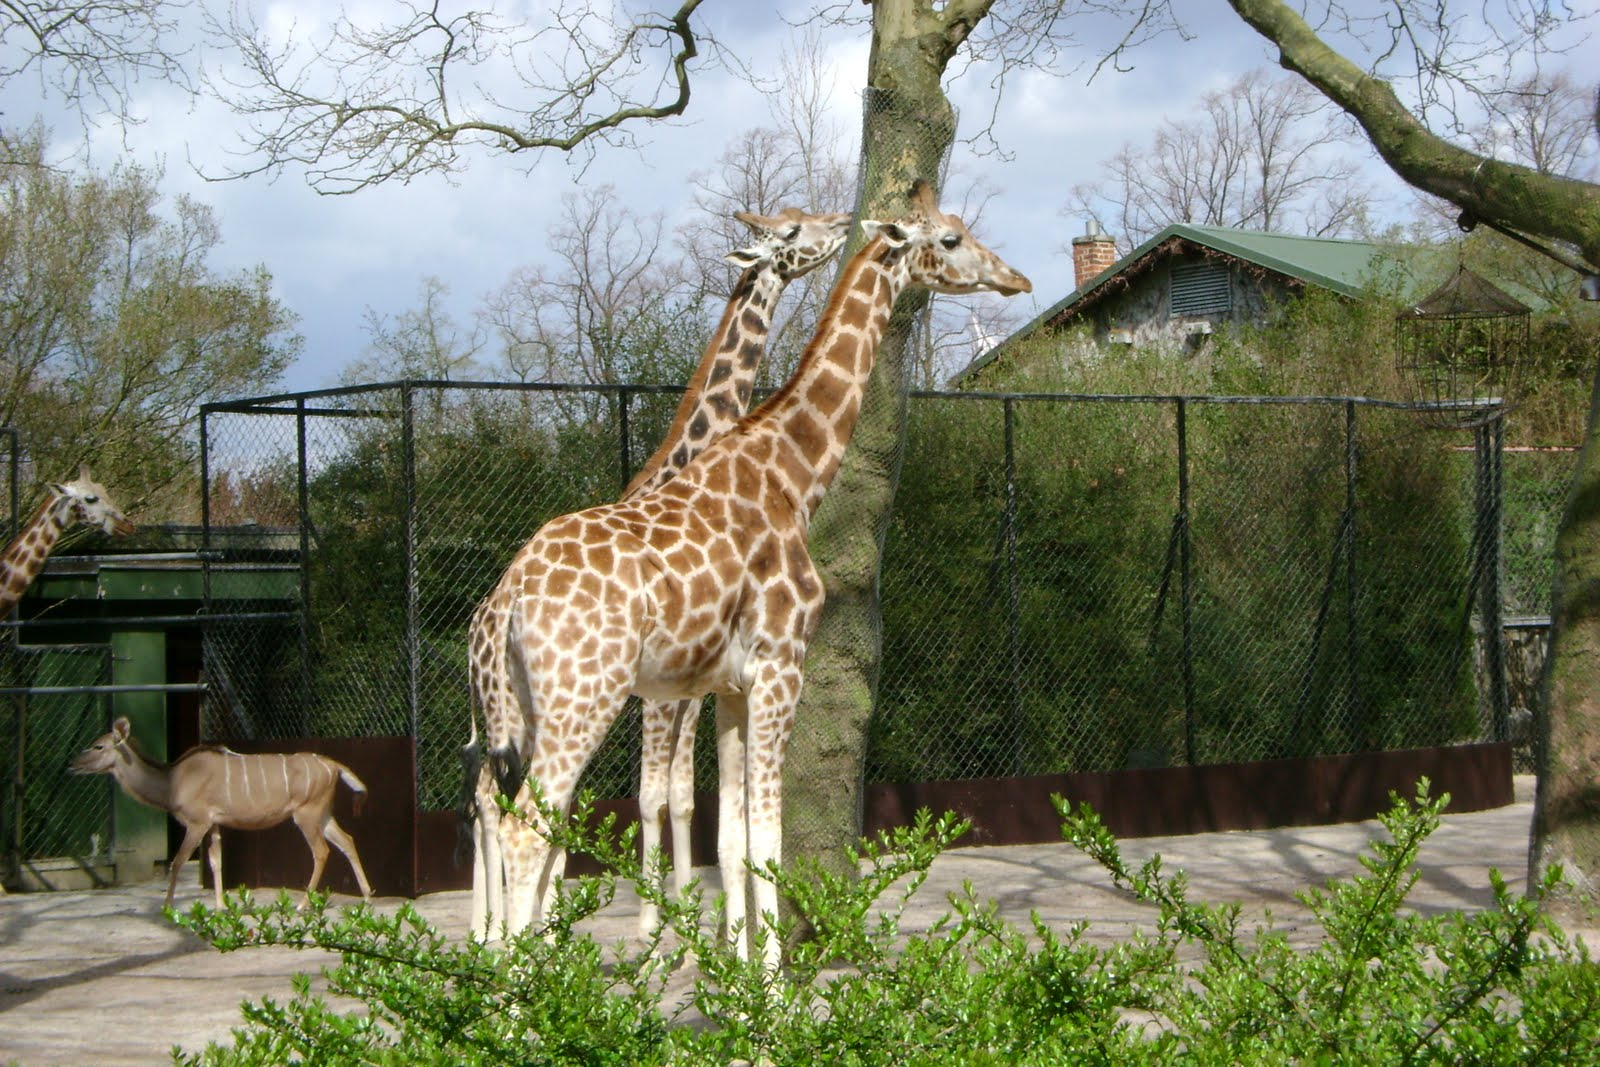 prescott 39 s overseas adventures the hamburg zoo. Black Bedroom Furniture Sets. Home Design Ideas